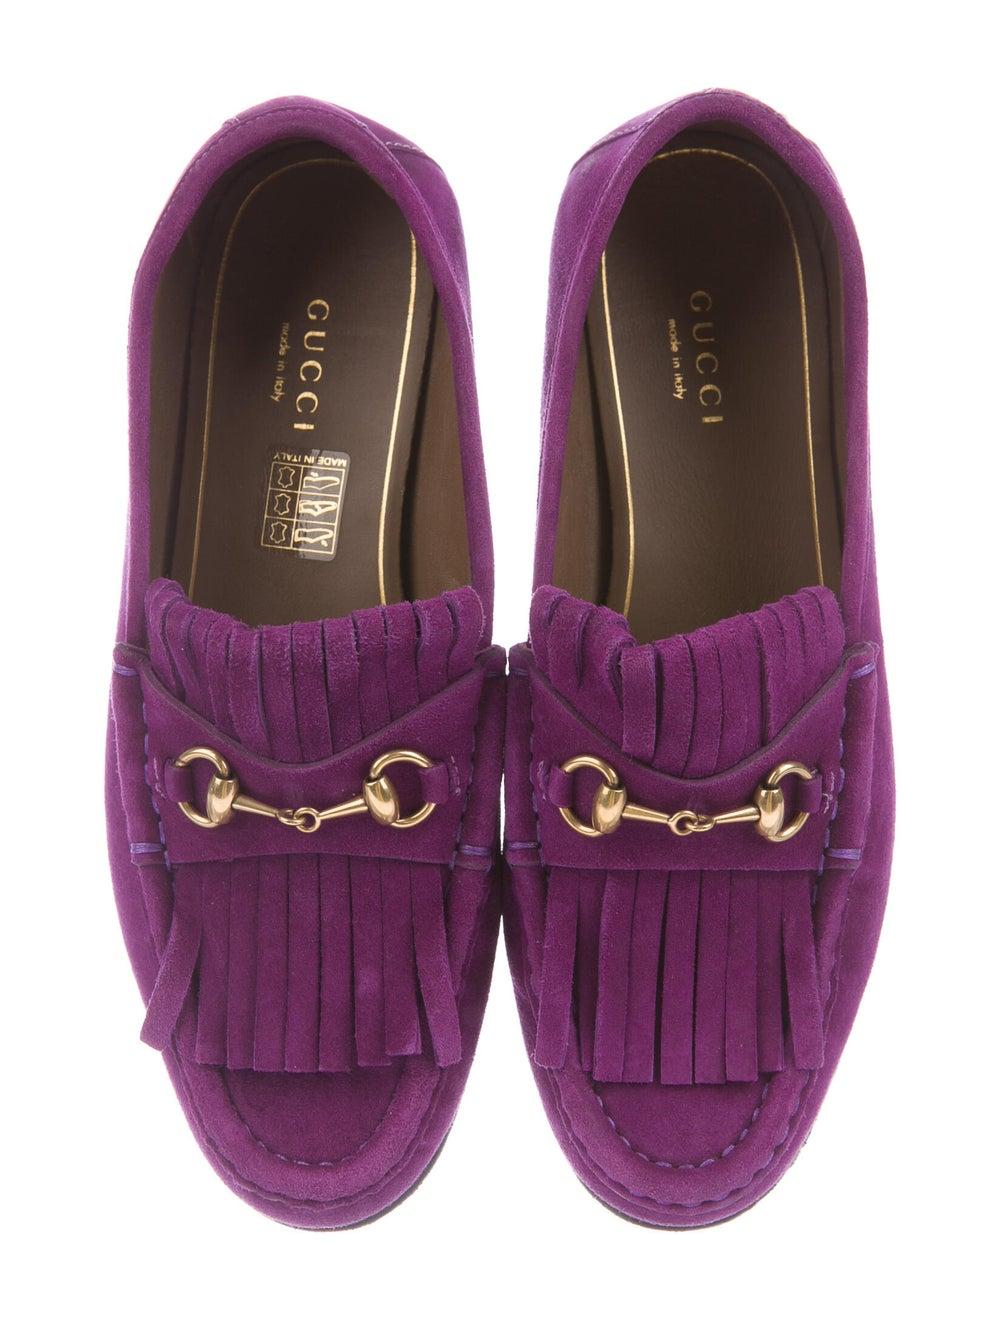 Gucci Horsebit Accent Suede Loafers Purple - image 3